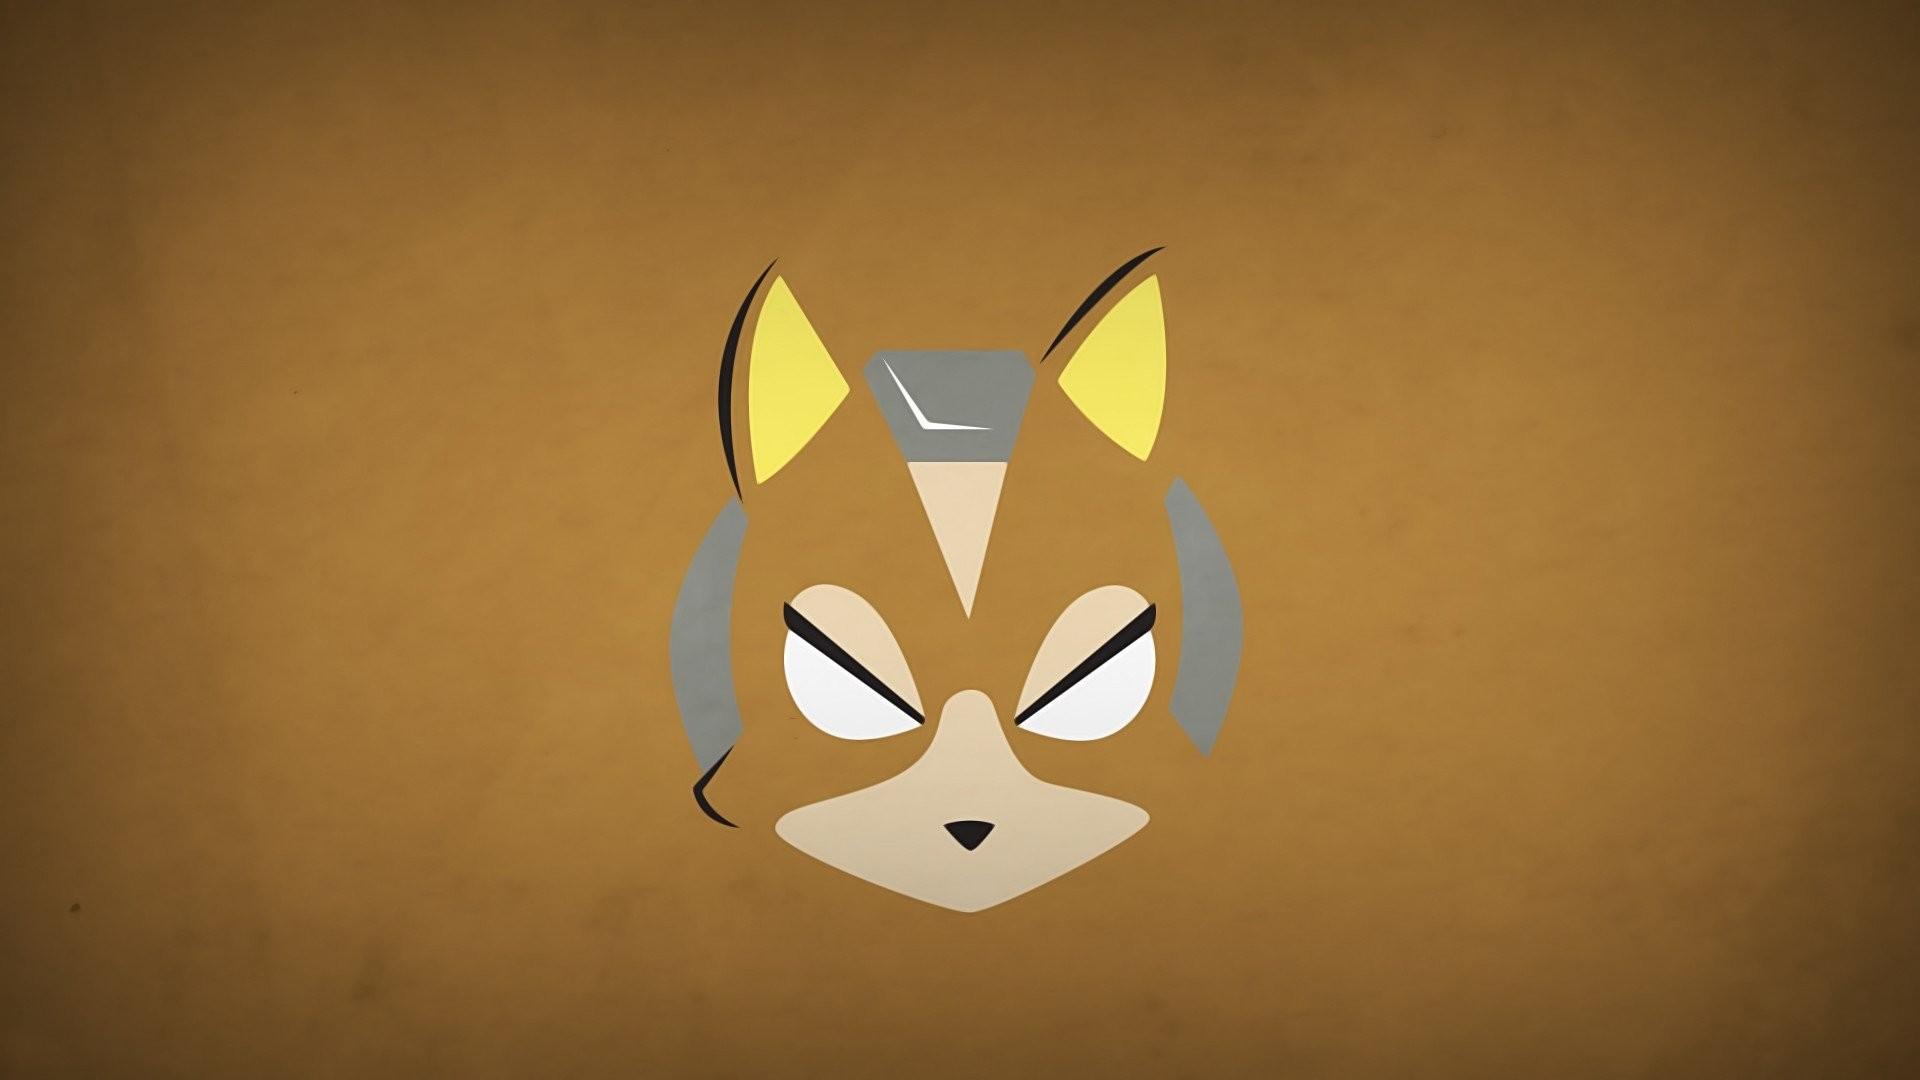 HD Wallpaper   Background ID:658094. Video Game Star Fox. 1 Like